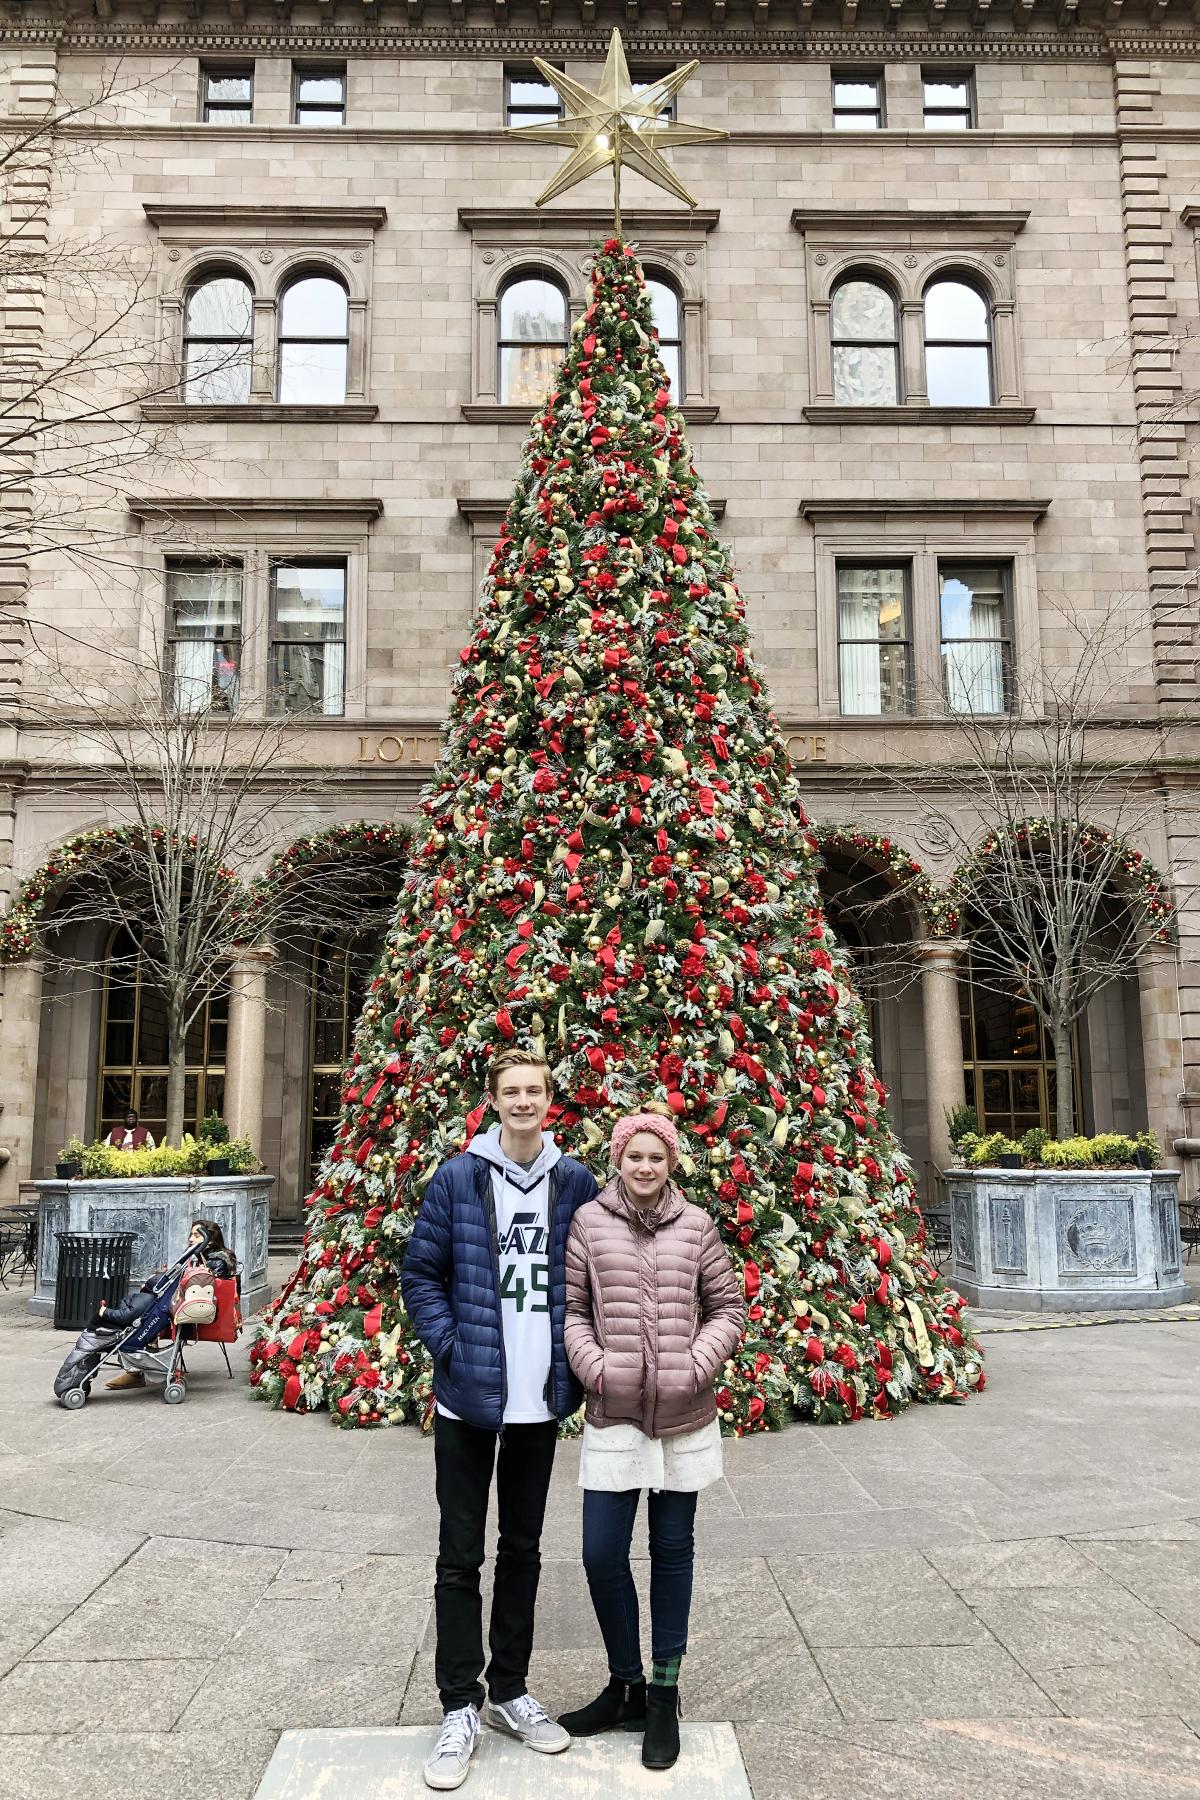 Lotte new york palace at christmas